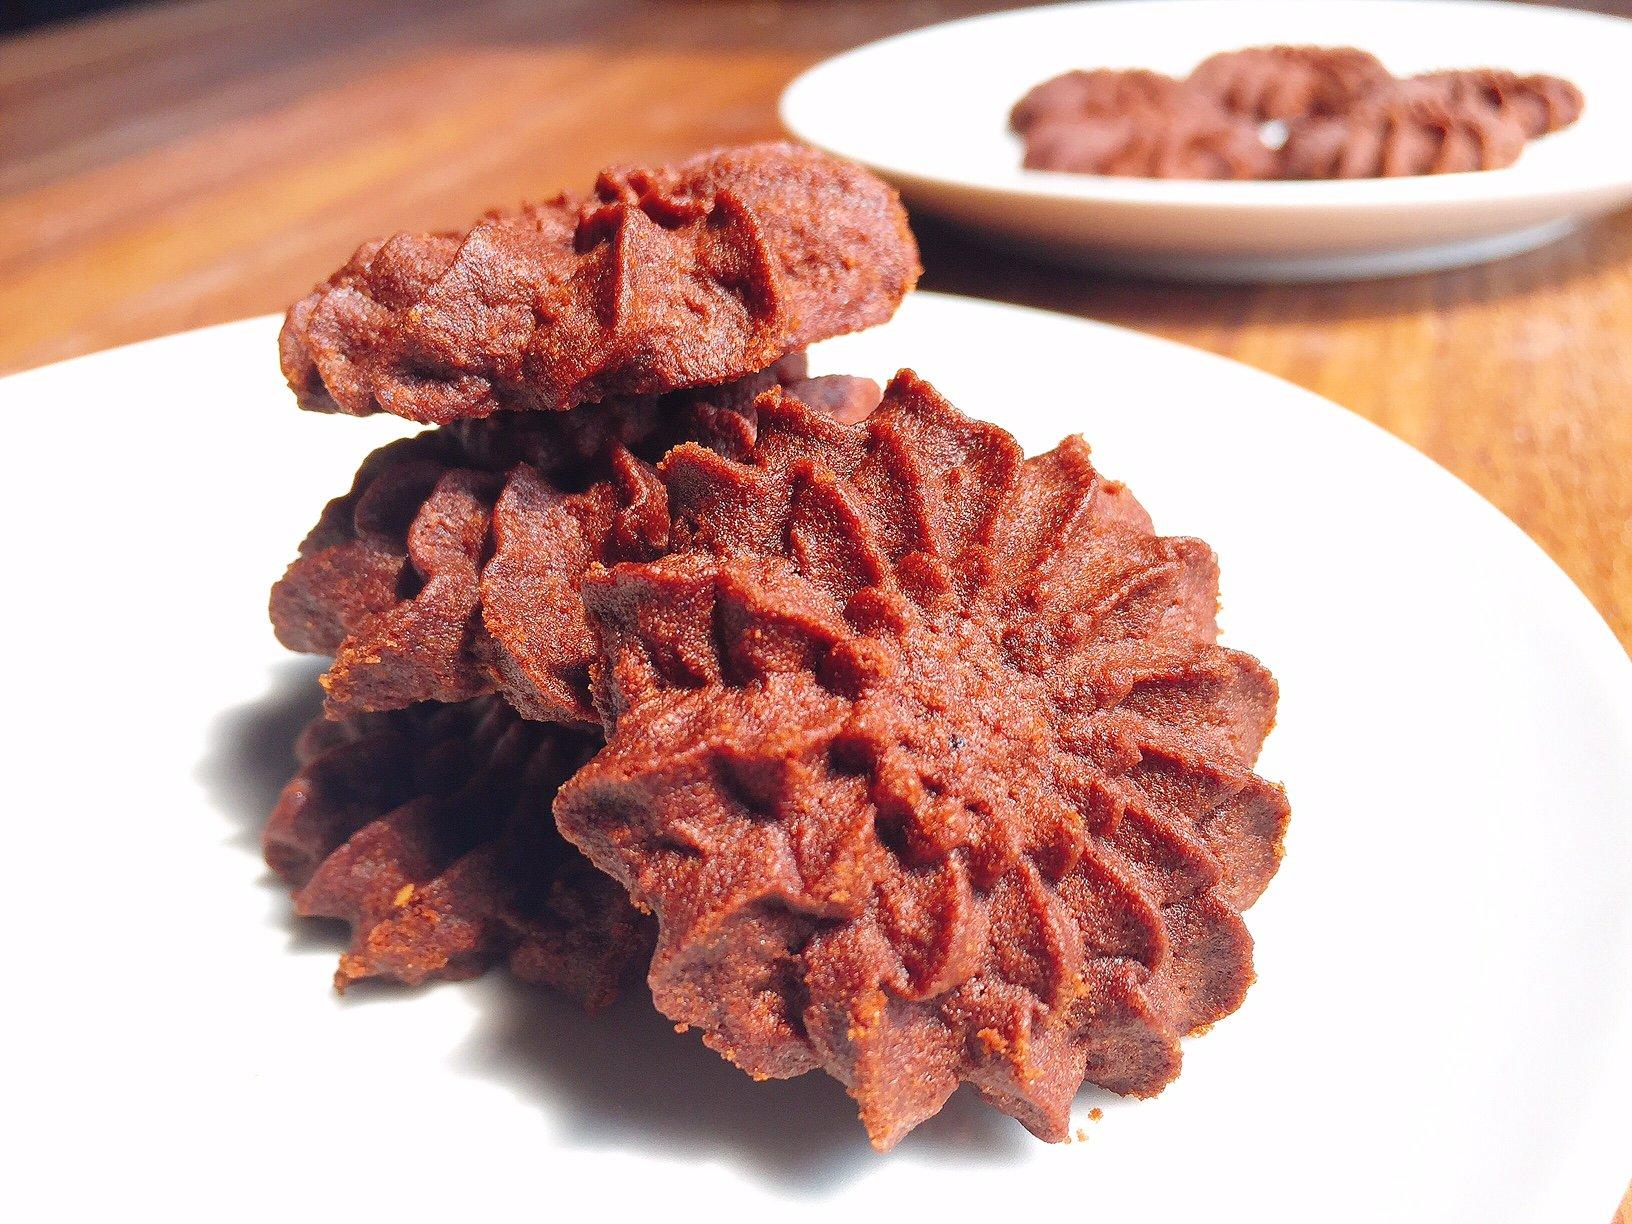 resep kue kering semprit coklat untuk kue kering lebaran